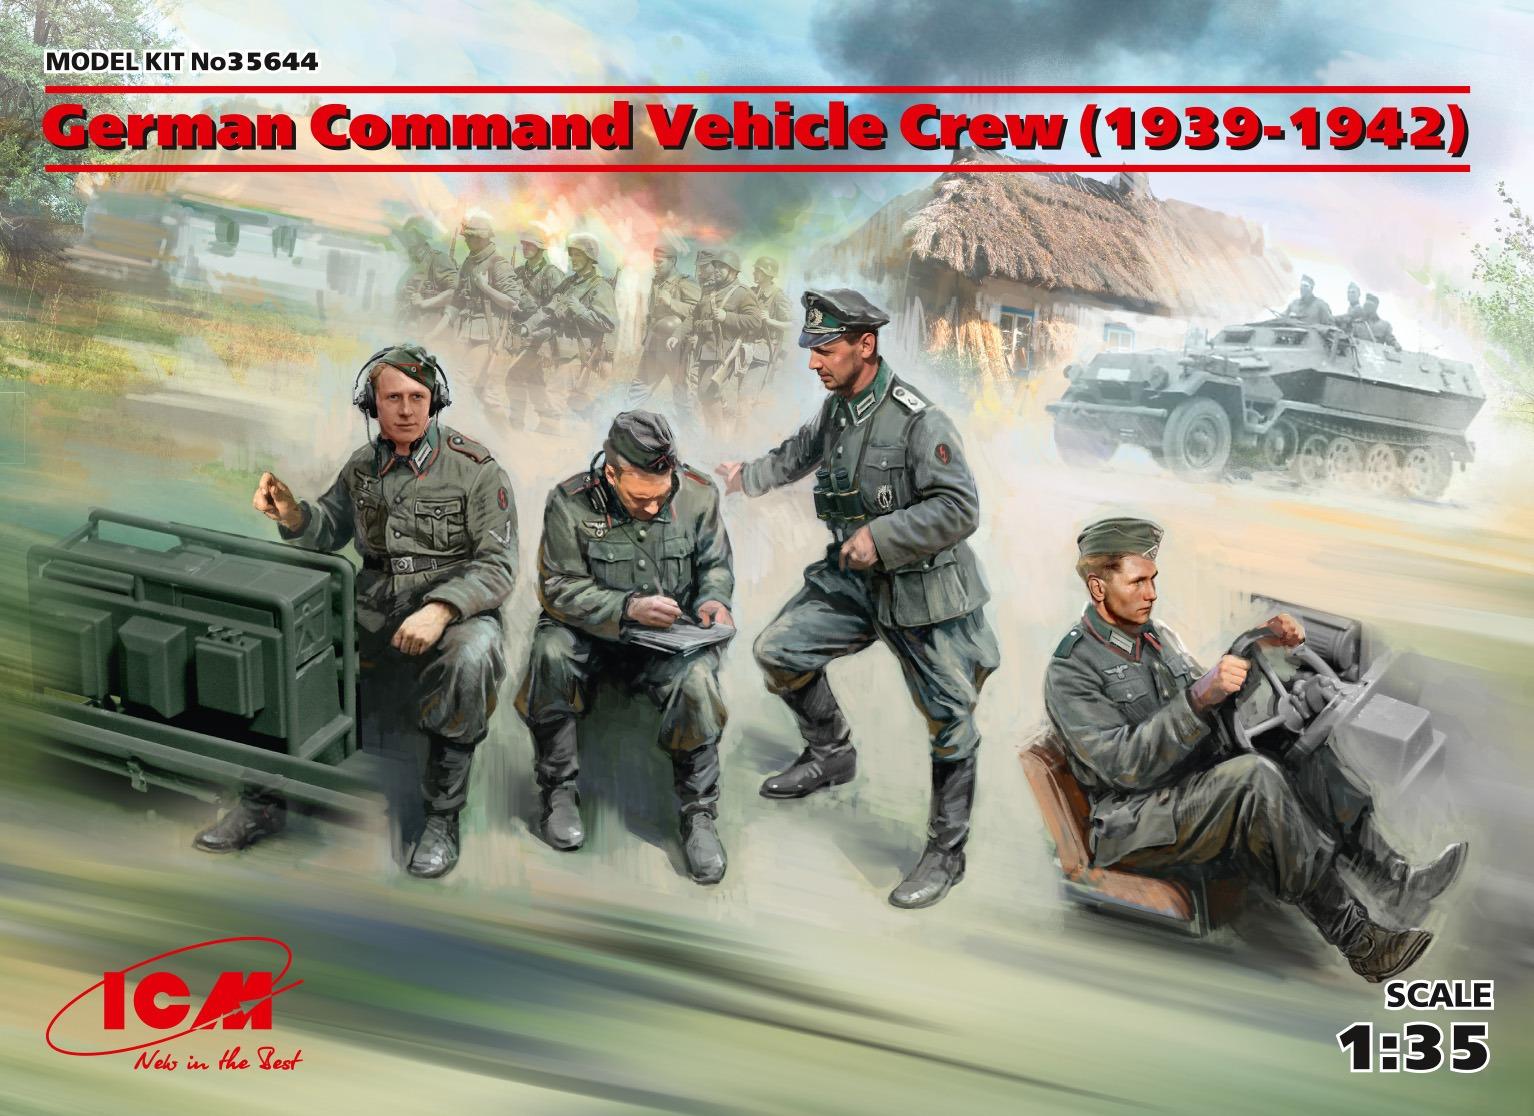 ICM 1/35 German Command Vehicle Crew (1939-1942) (4 figures) (100% new molds)